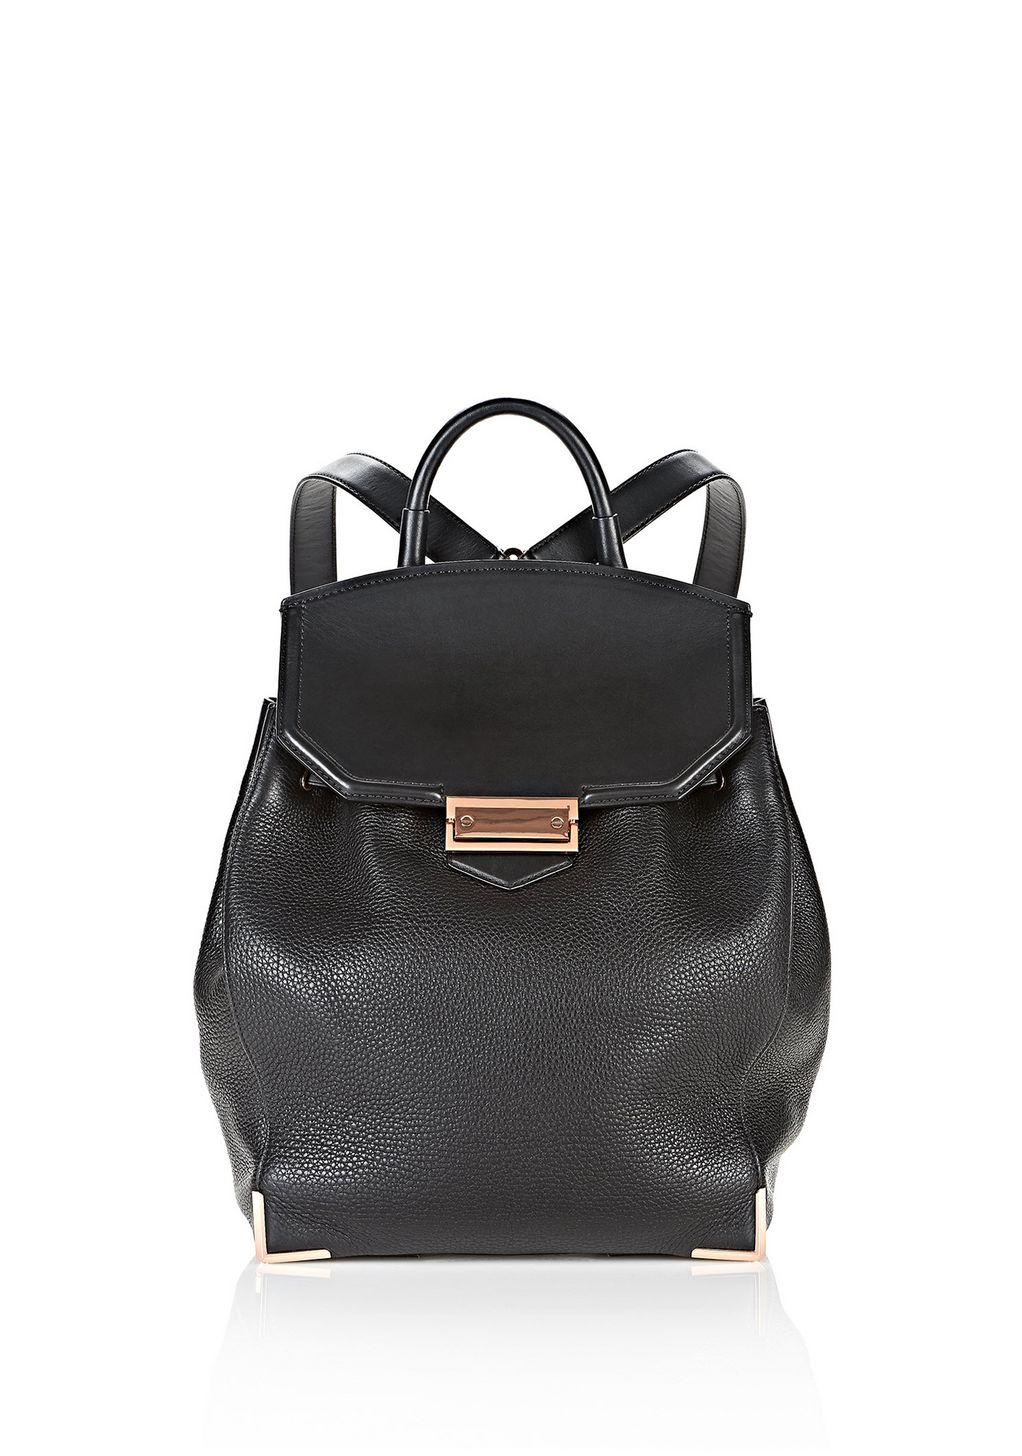 Alexander Wang Prisma Skeletal Backpack In Soft Black With